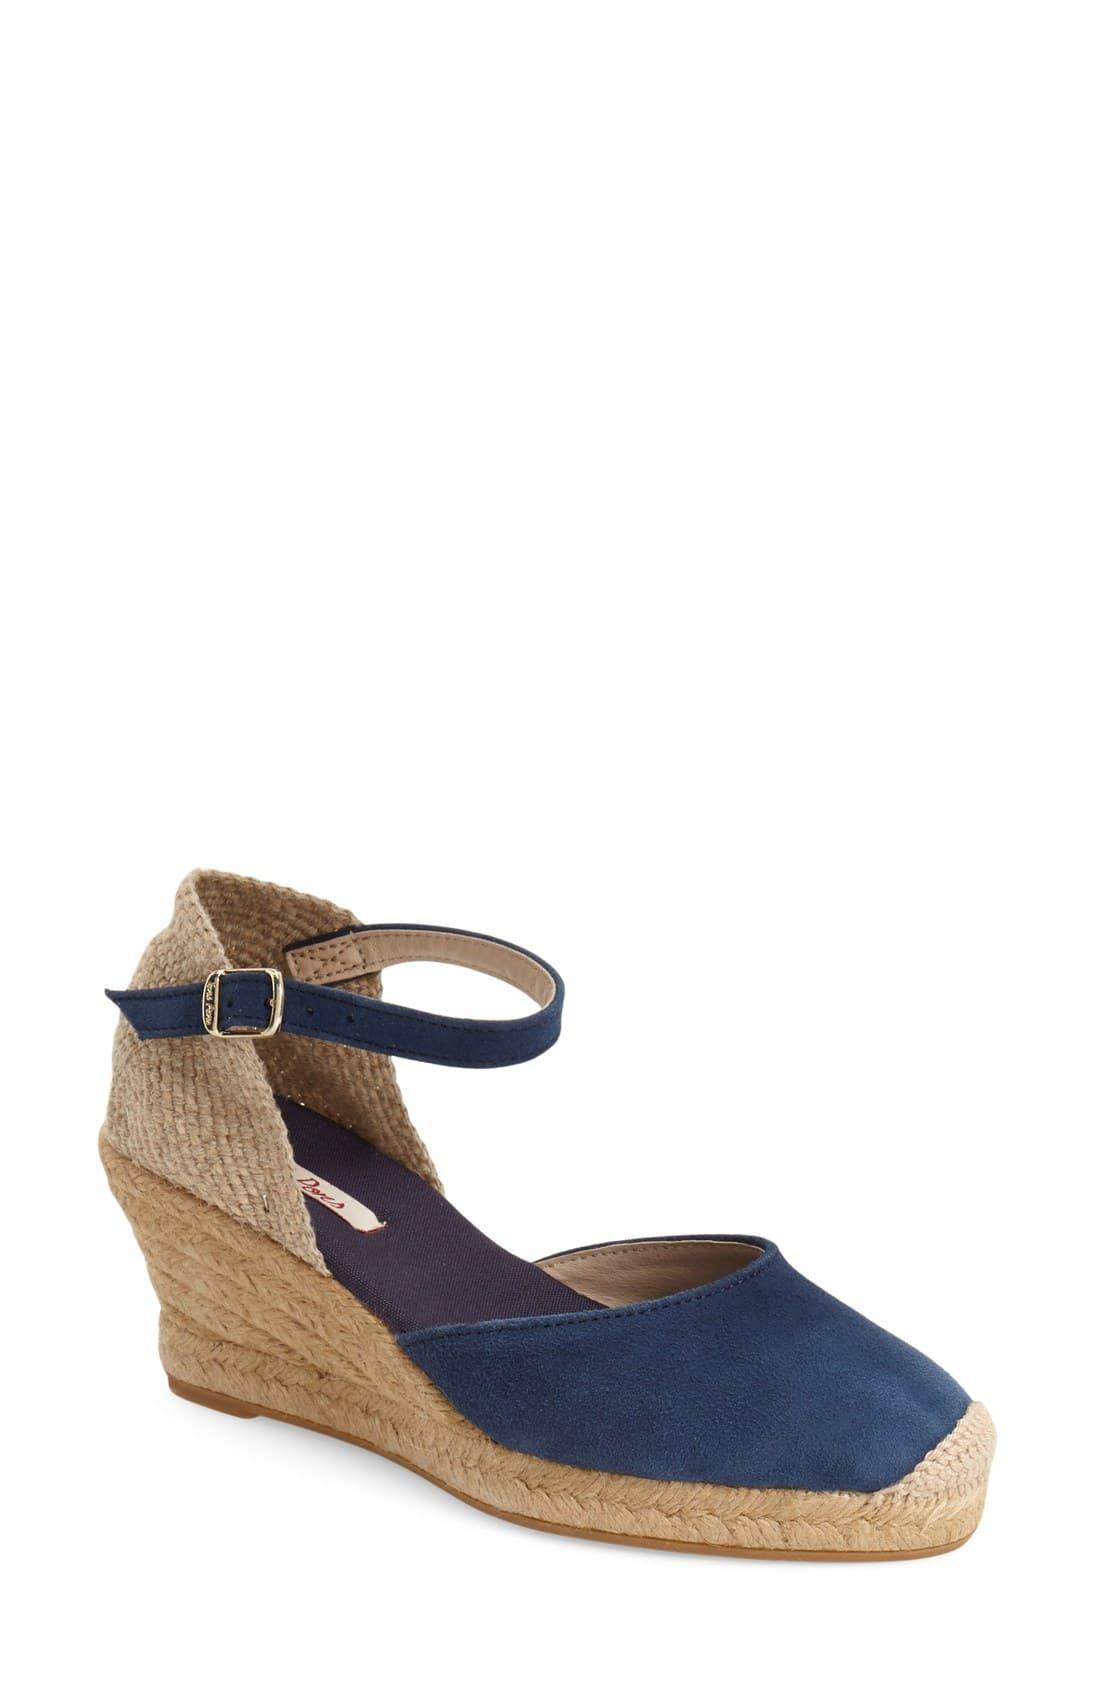 7964c534 Women's Toni Pons 'Lloret-5' Espadrille Wedge Sandal, Size 9-9.5US / 40EU -  Blue